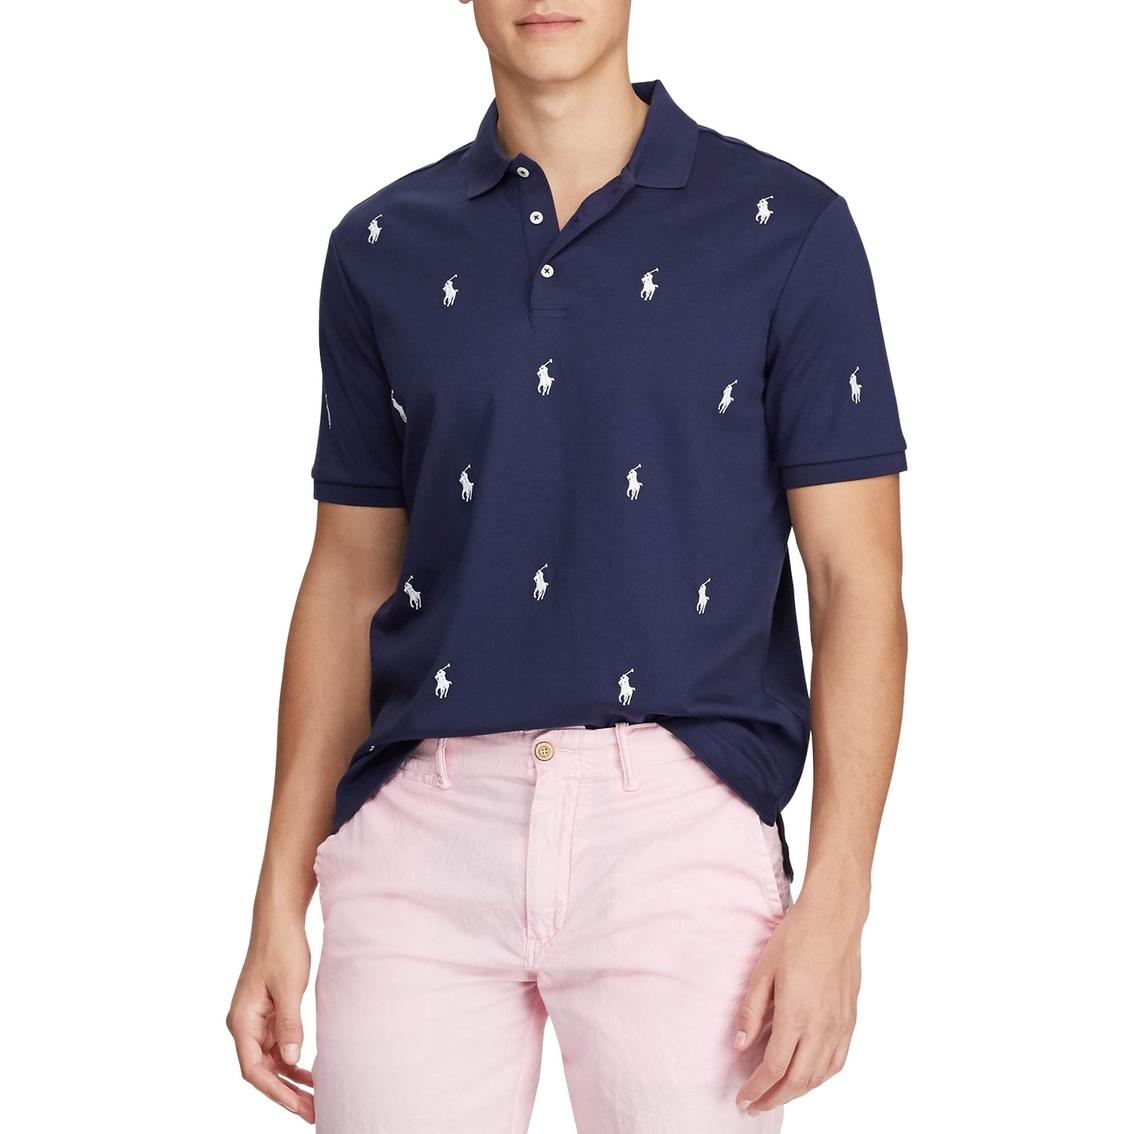 a1cc1bc5 Polo Ralph Lauren Classic Fit Allover Pony Polo Shirt | Polos ...